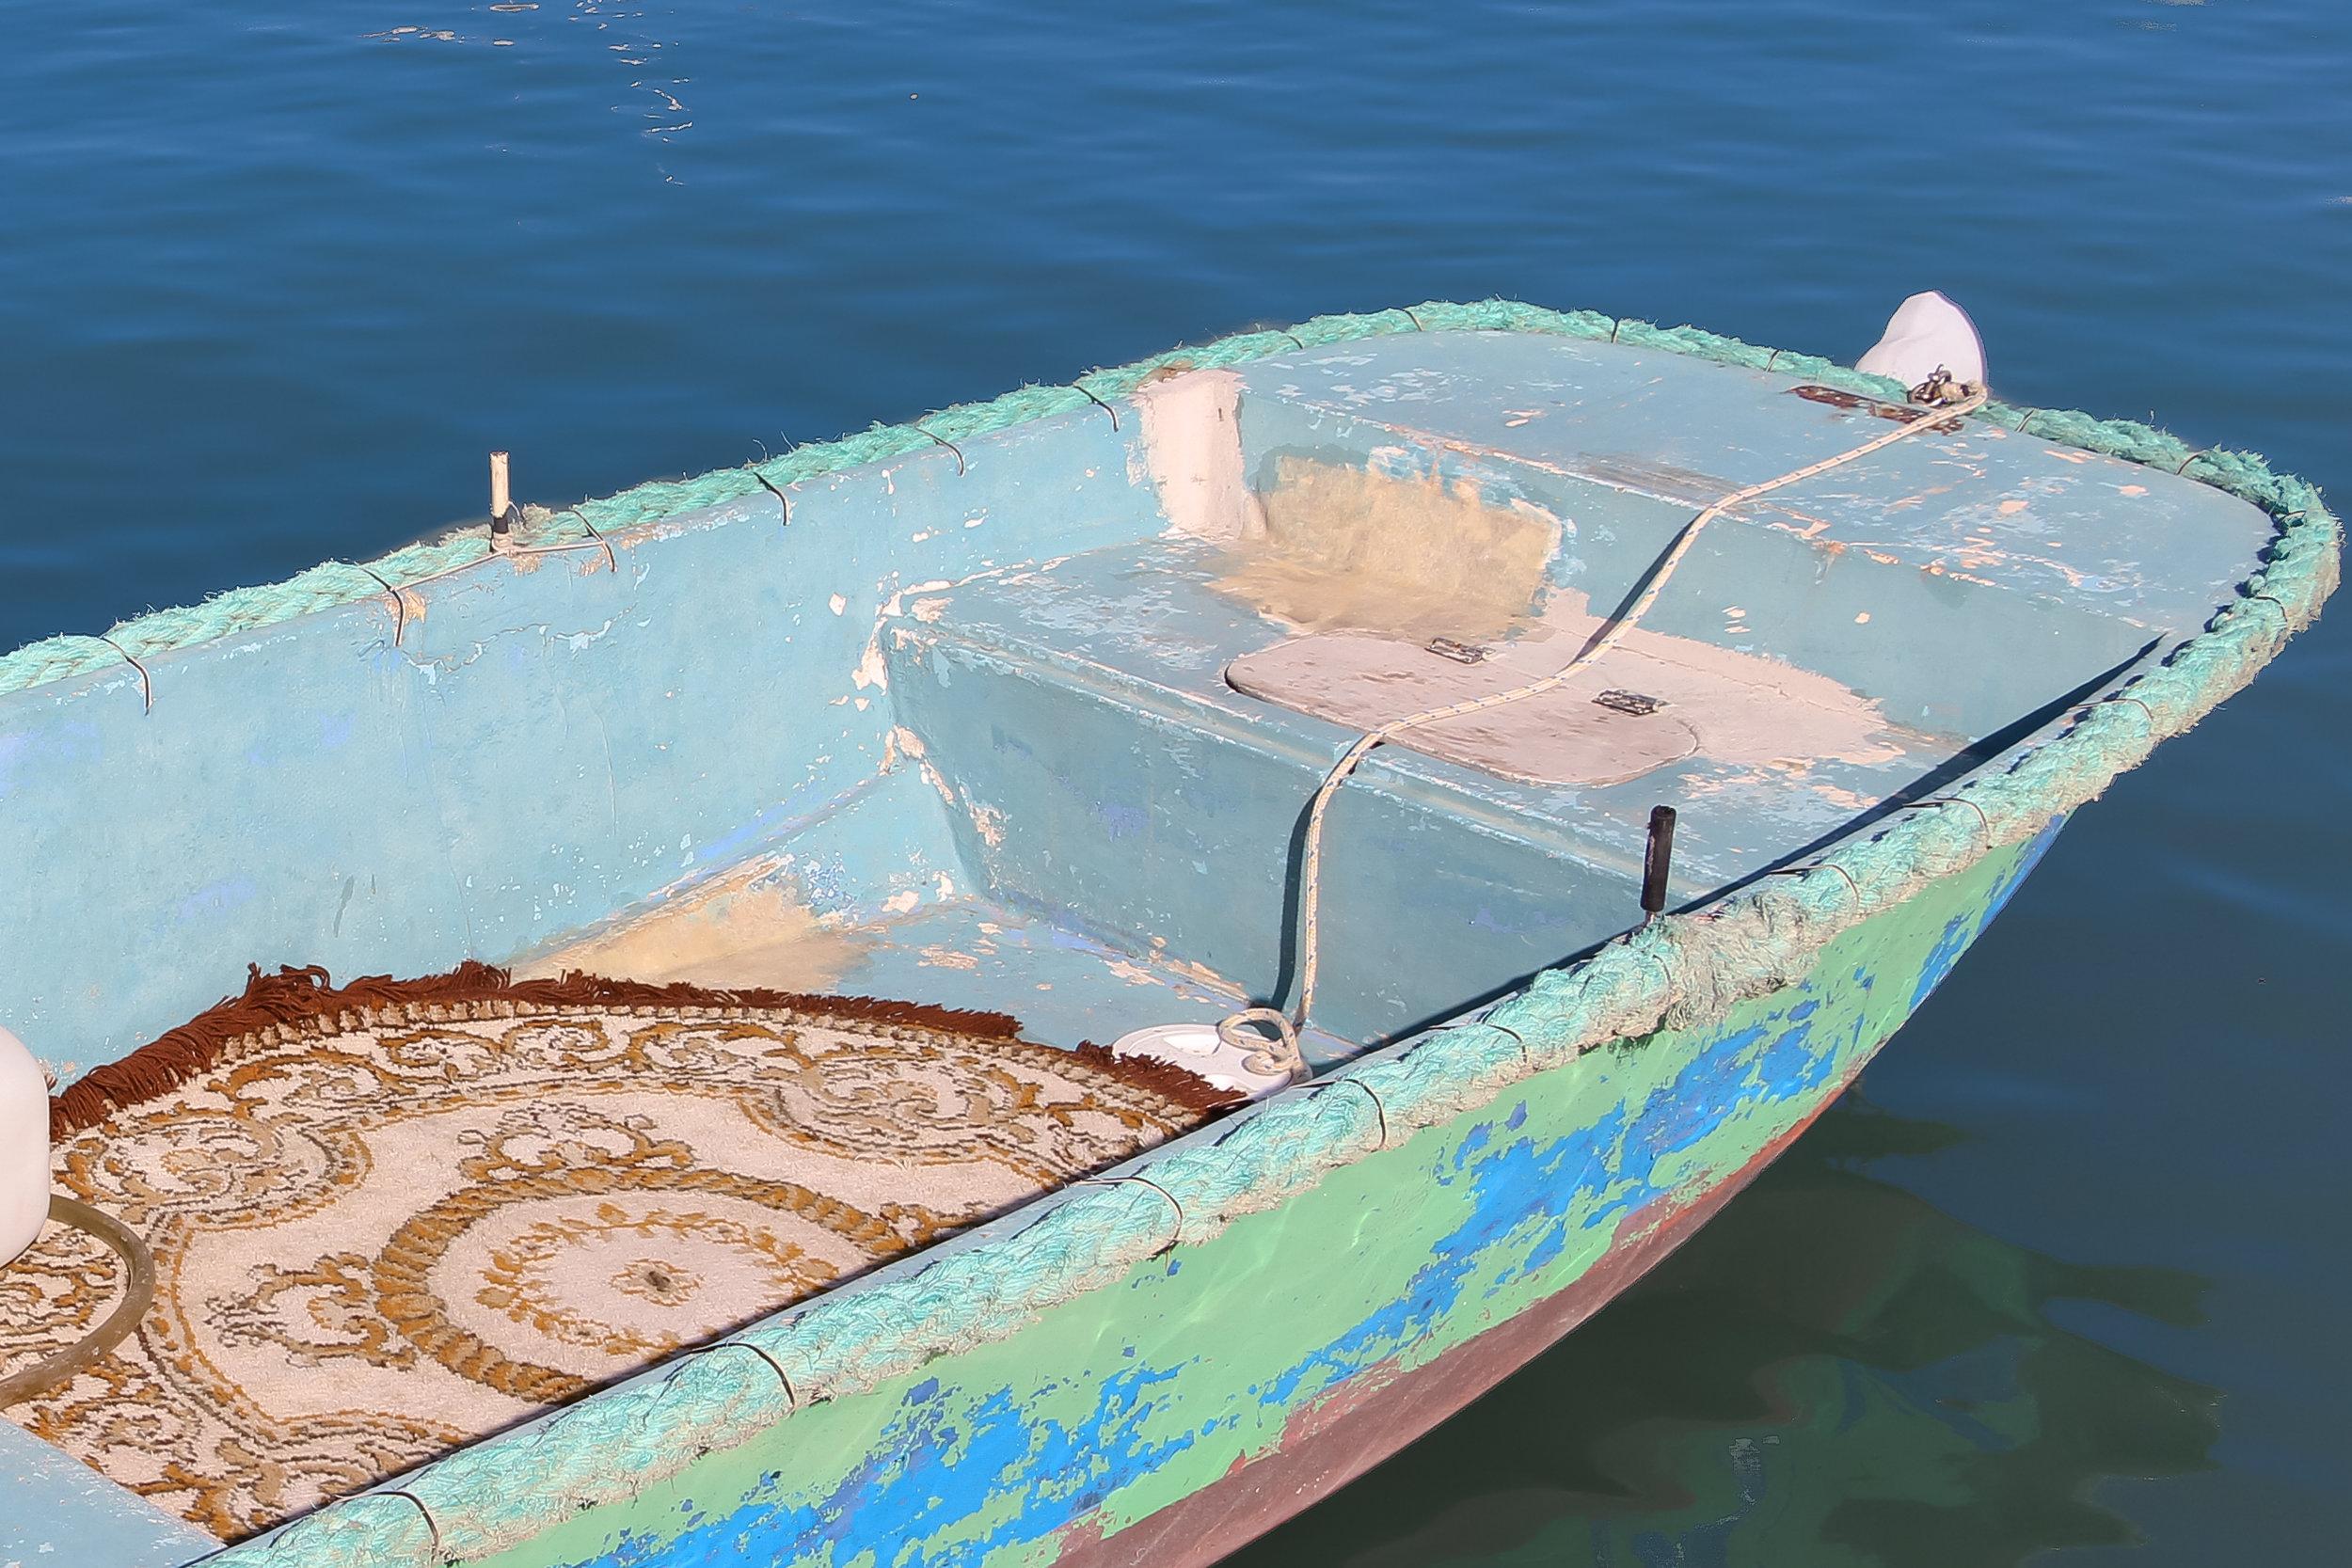 Maltese Boat   Traditional Fishing Village   Mediterranean Sea   Marsaxlokk - Thinking About Appreciation For Quality In Malta   Malta, Europe   DoLessGetMoreDone.com   - Canon Minimal Travel Documentary Photography - search for Liveability   Sustainability